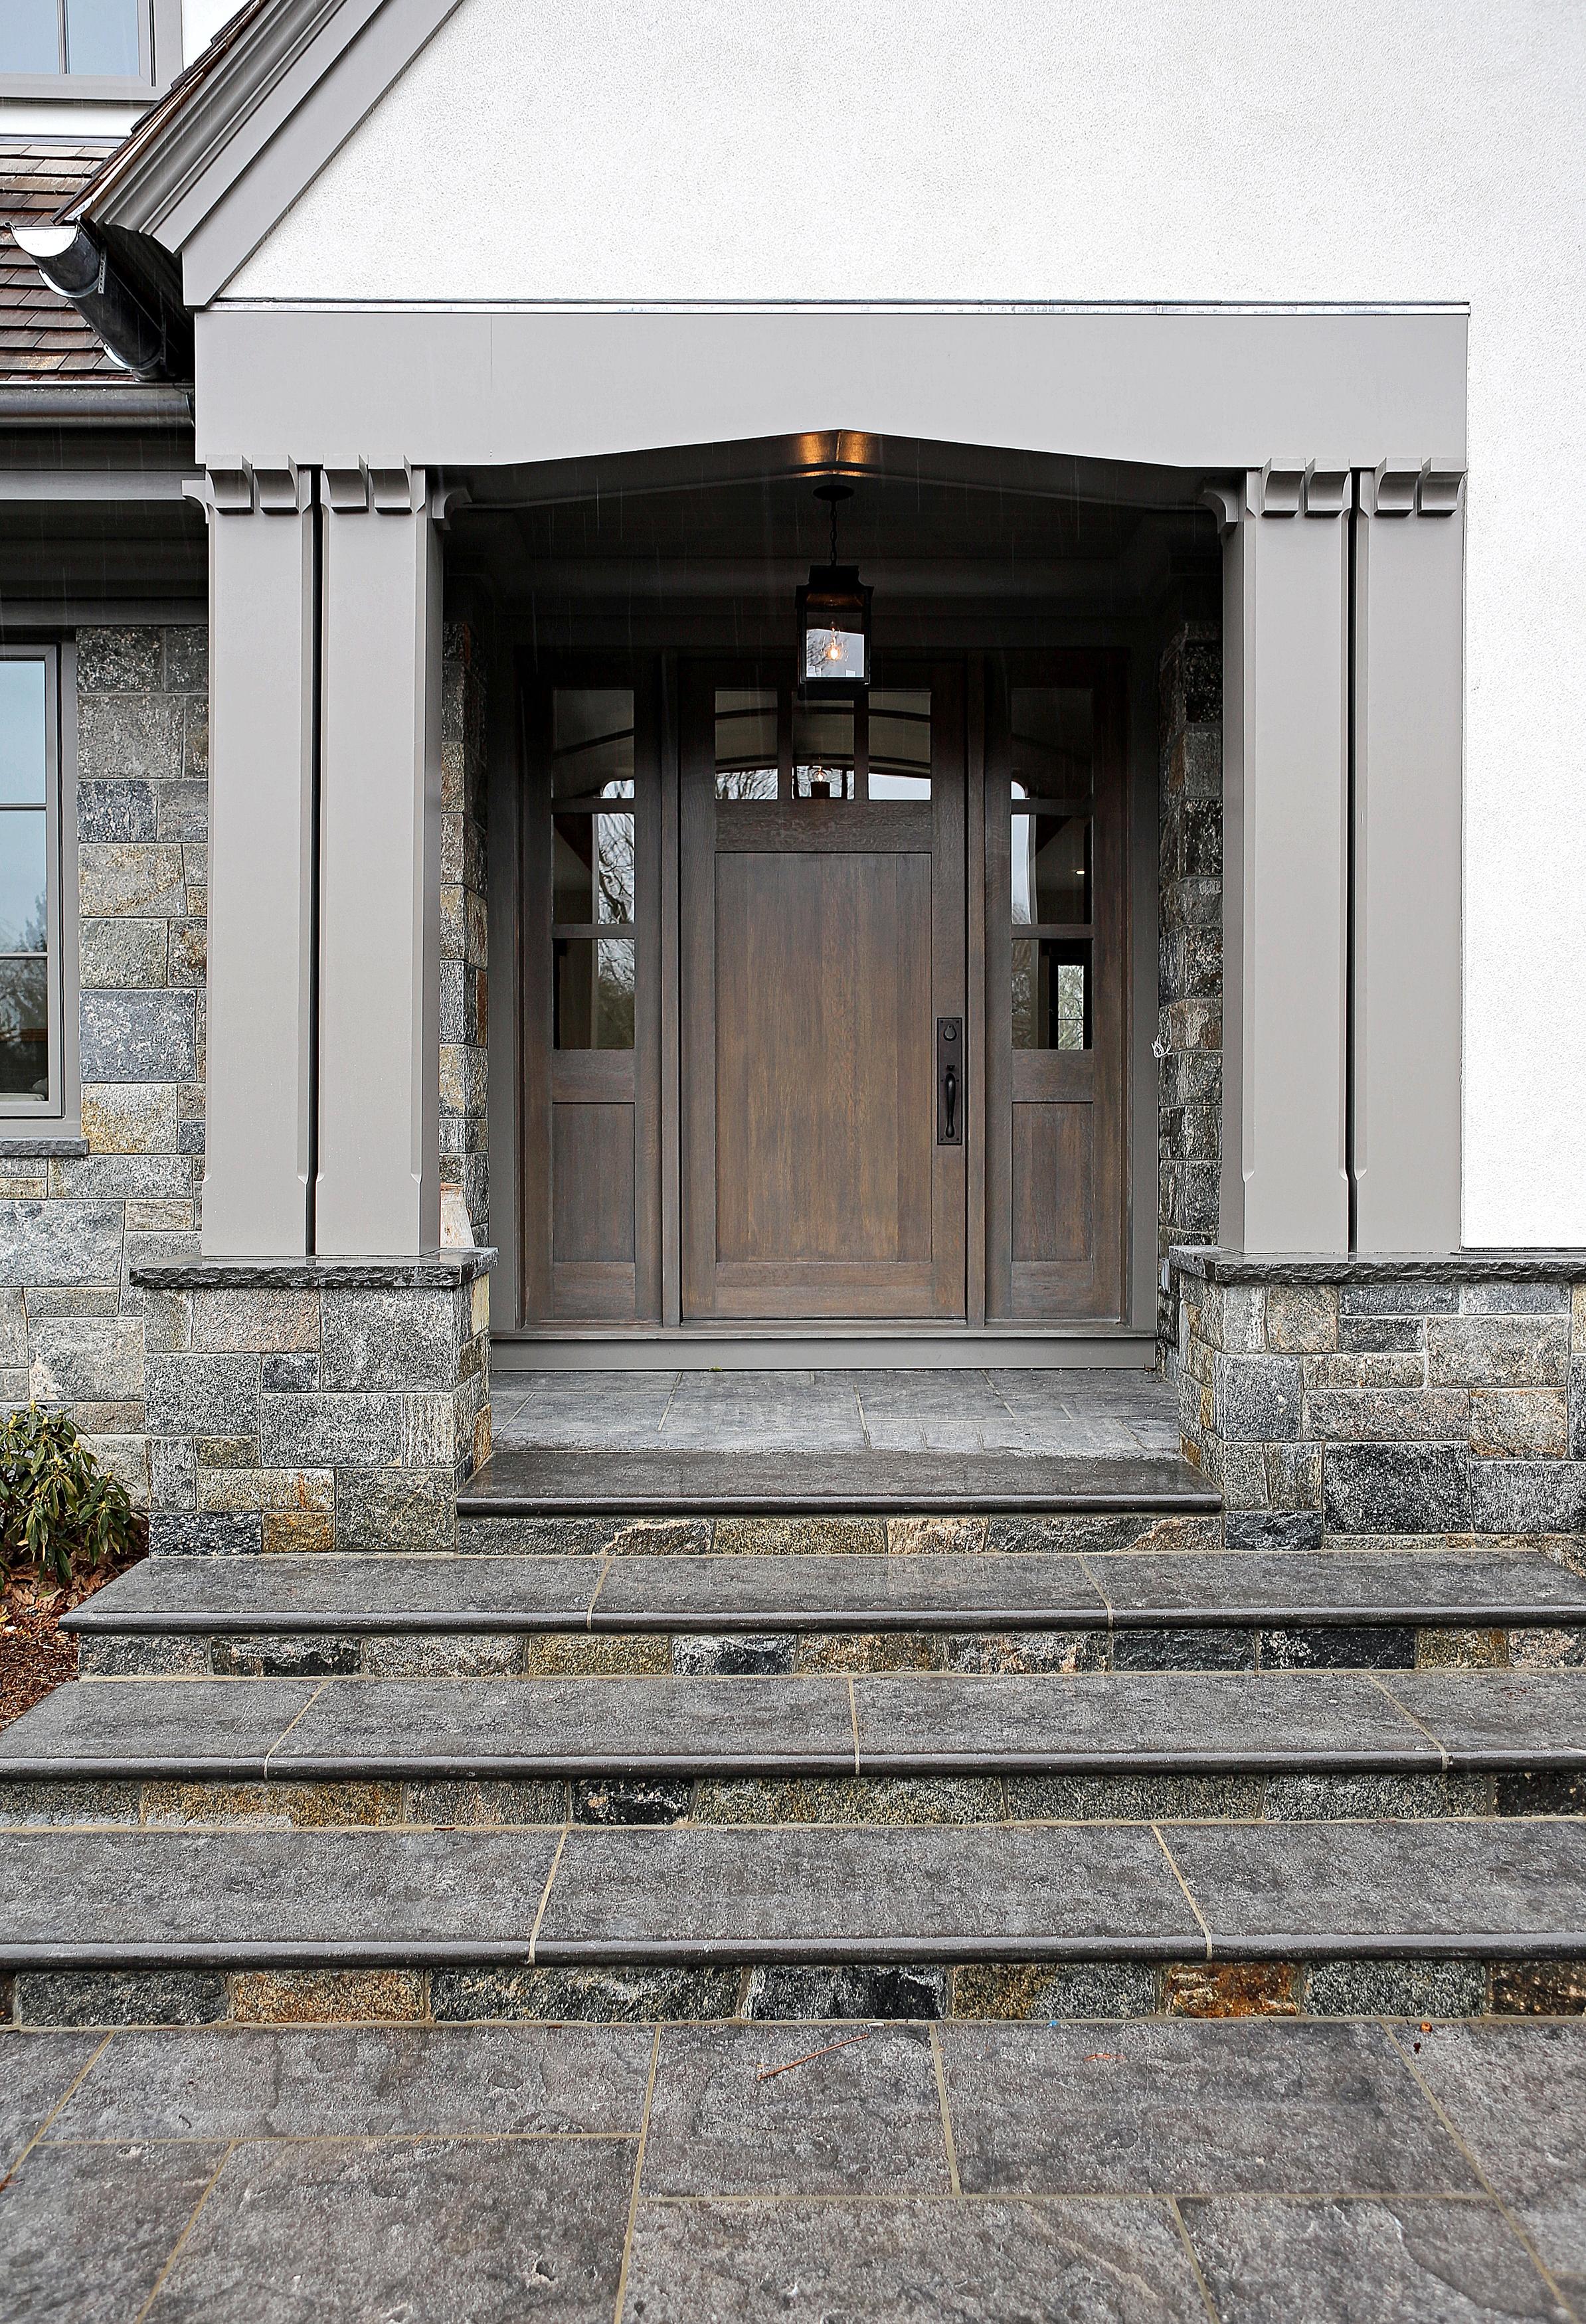 CHATEAU LIMESTONE STEPS, HONED